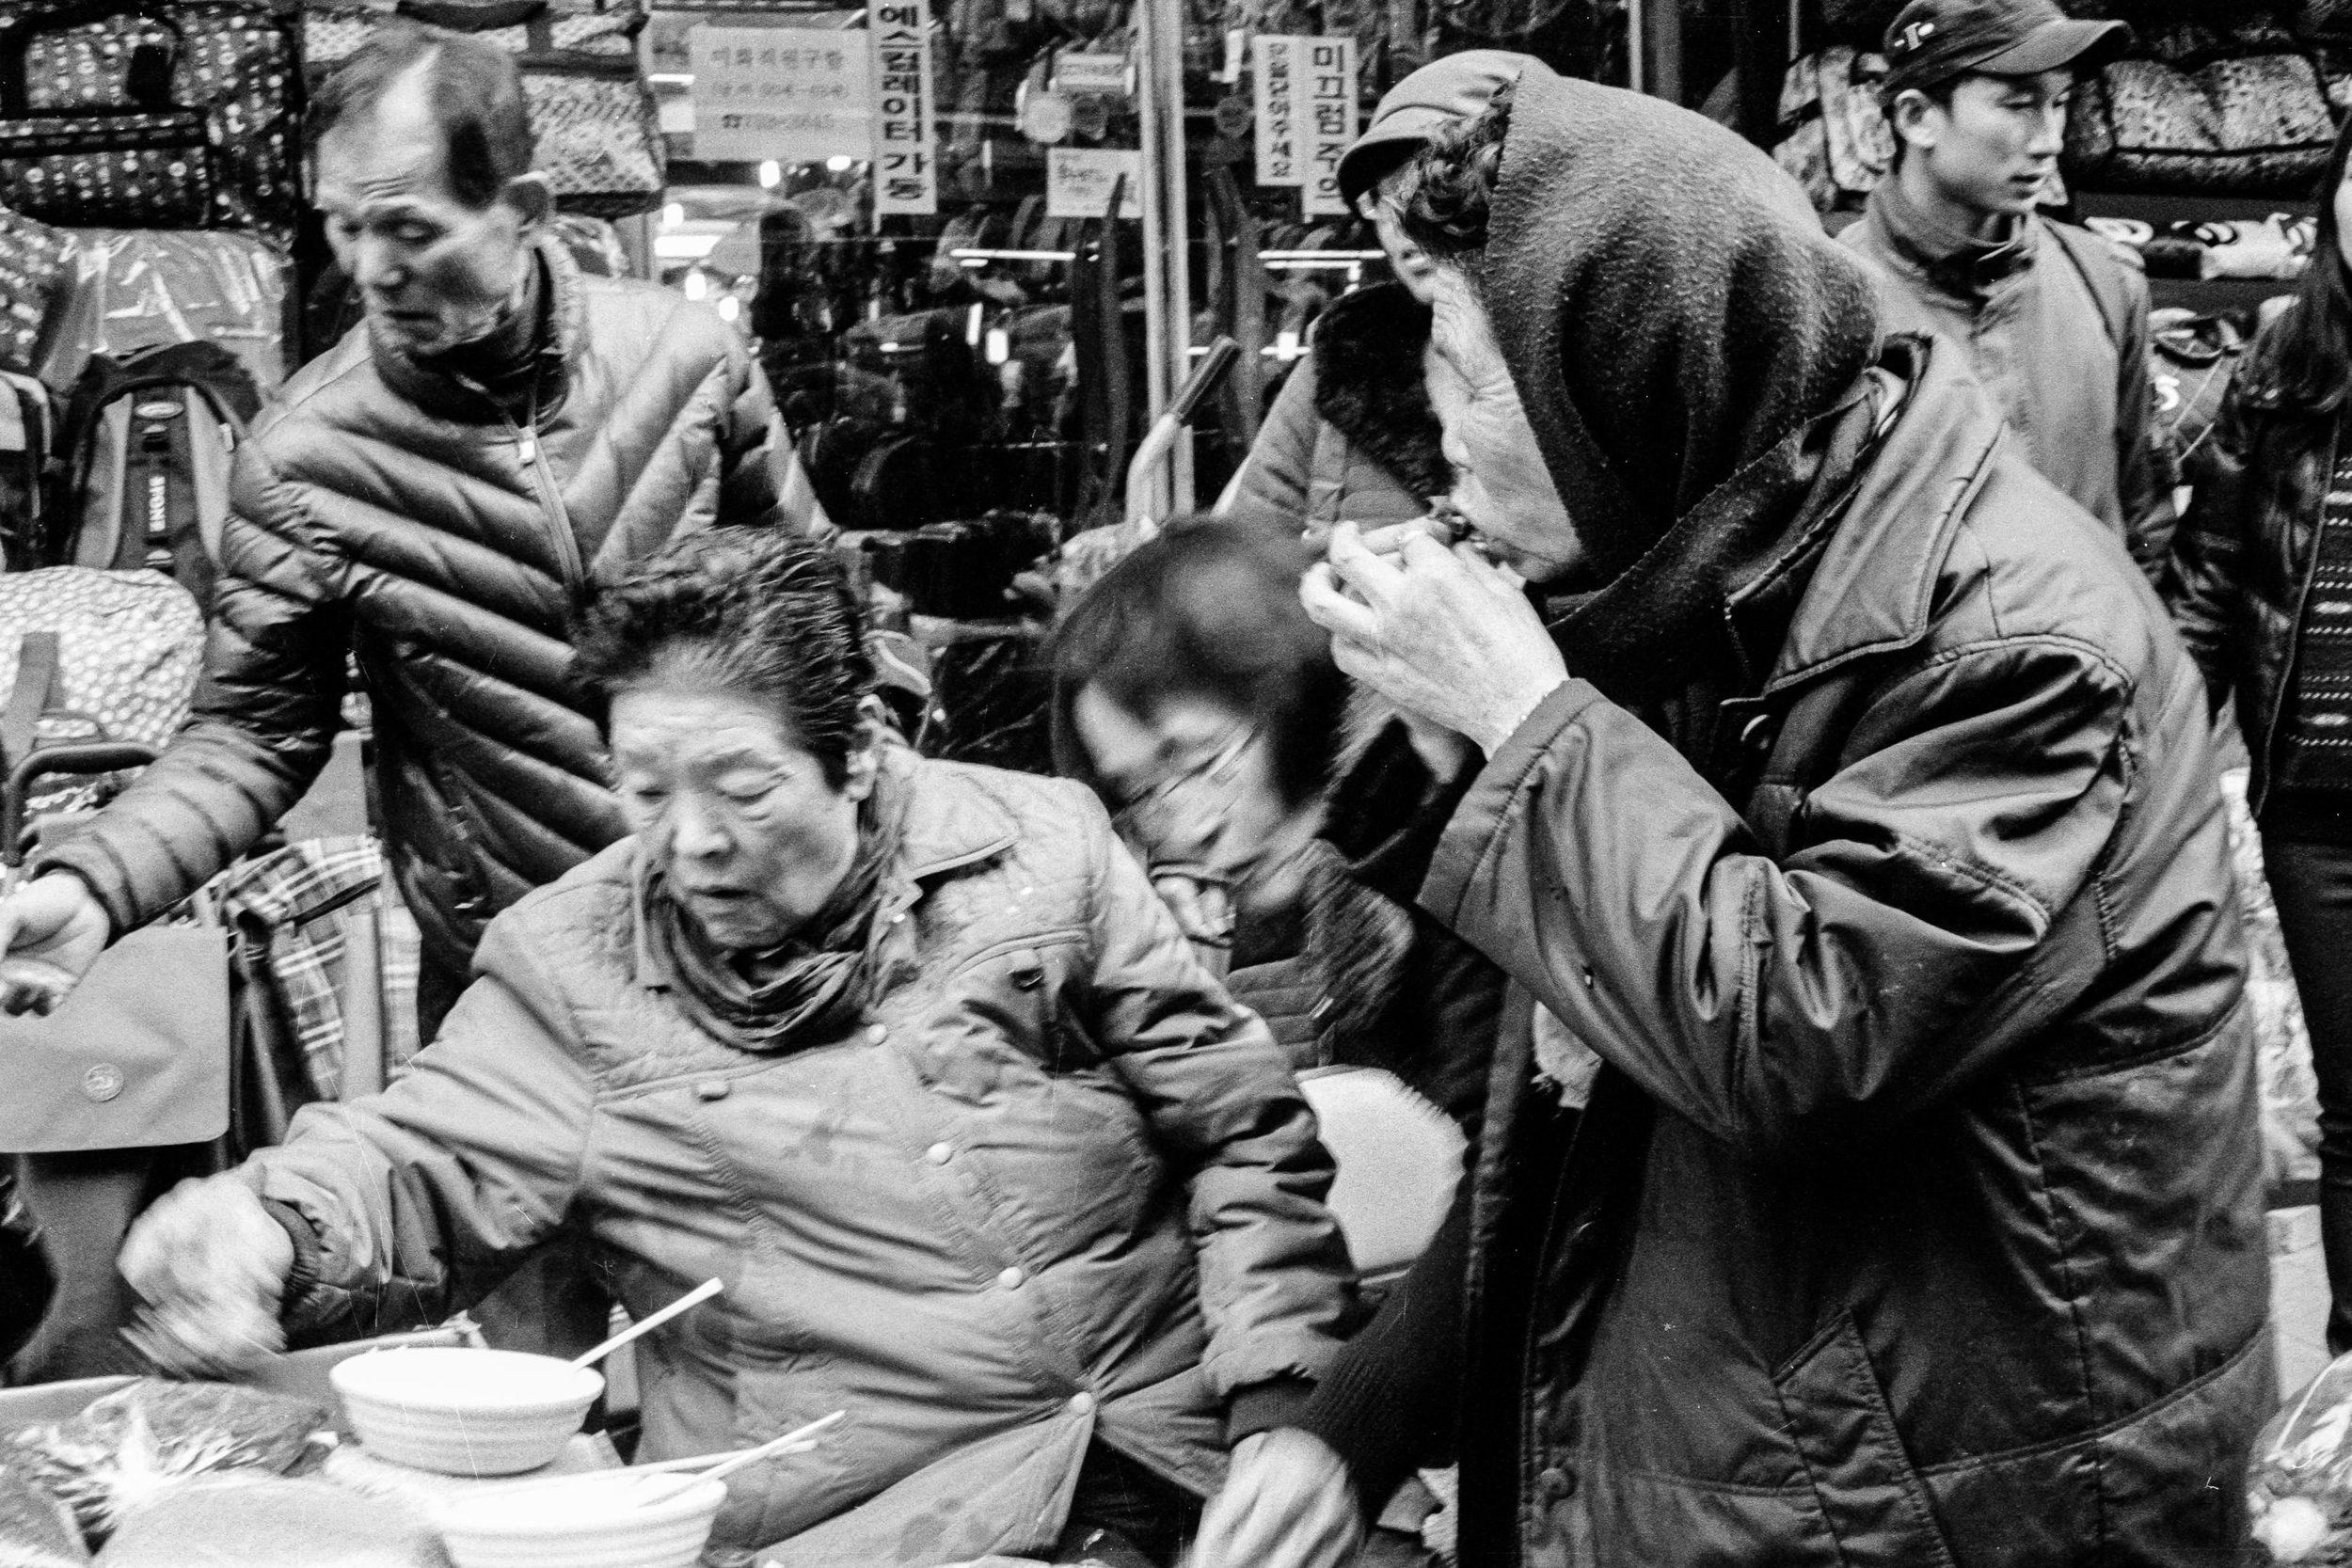 12-streetasiafilm-007.jpg